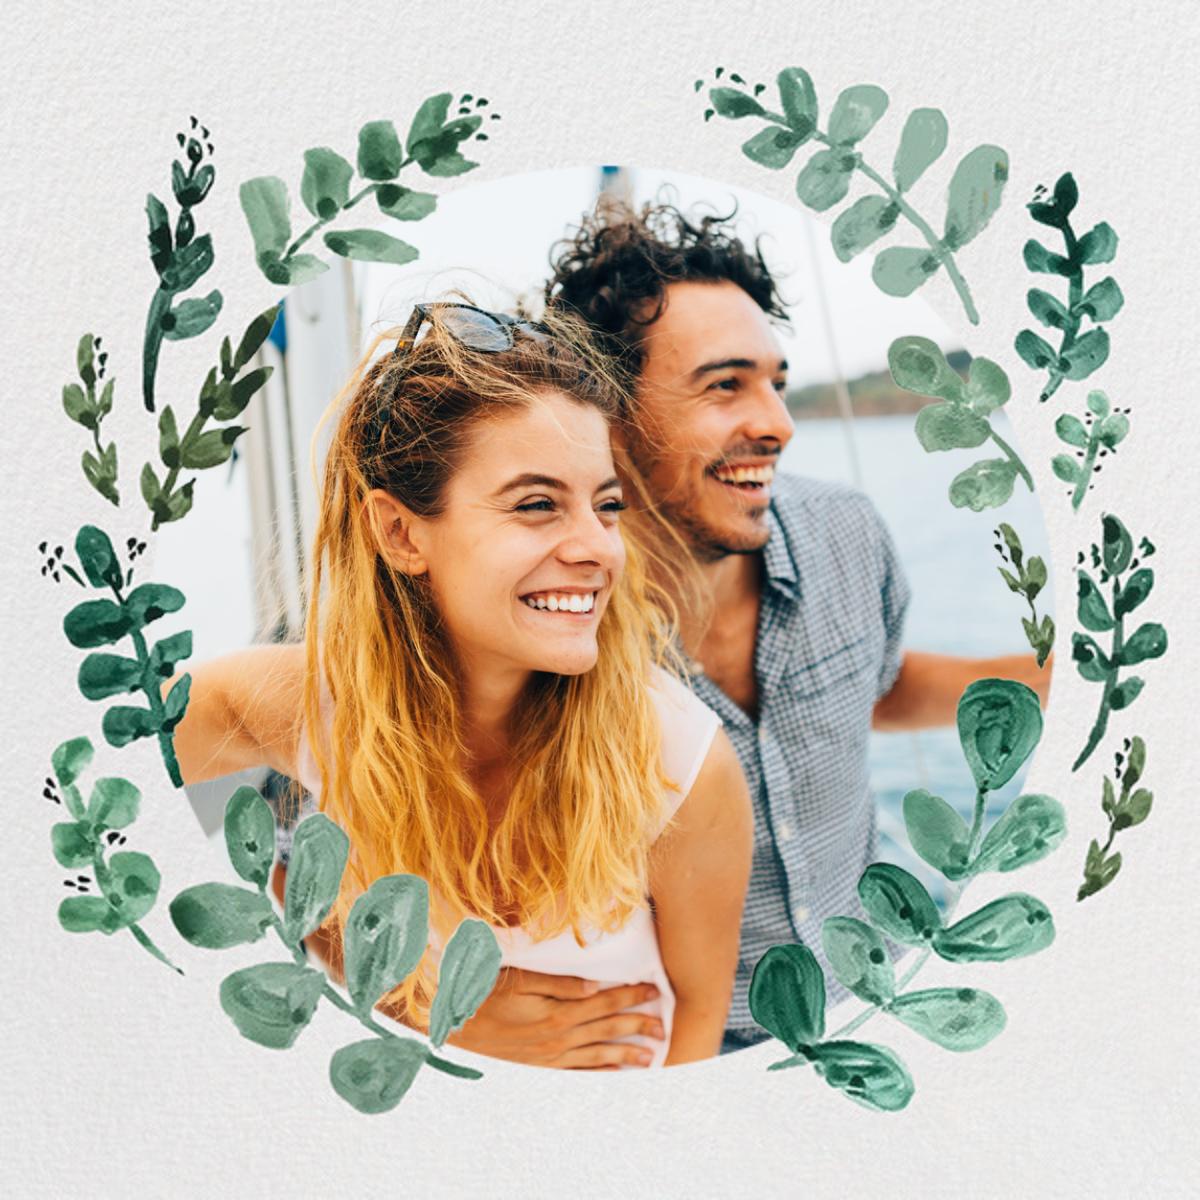 Eucalyptus Sprigs - Linda and Harriett - Save the date